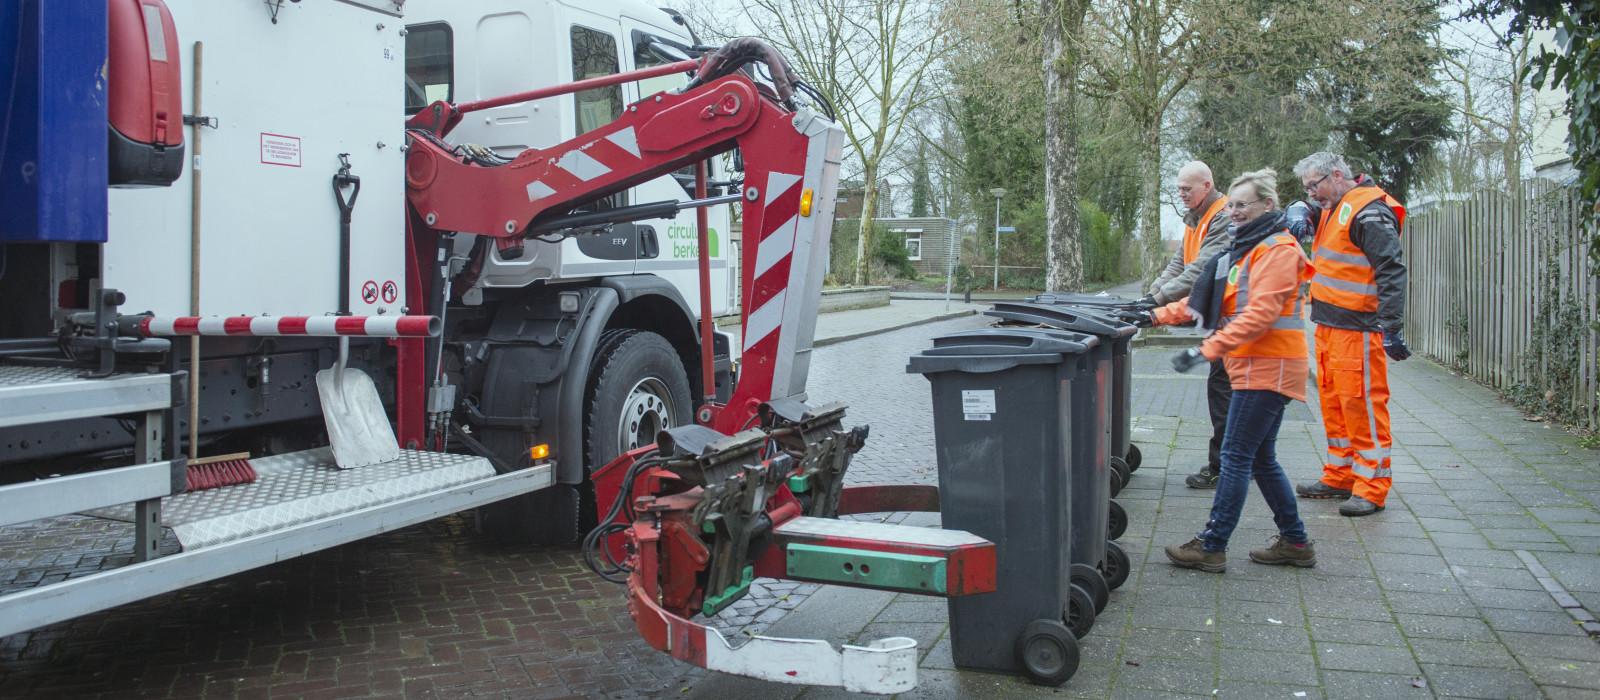 Inzameling oud papier met containers in Doesburg van start